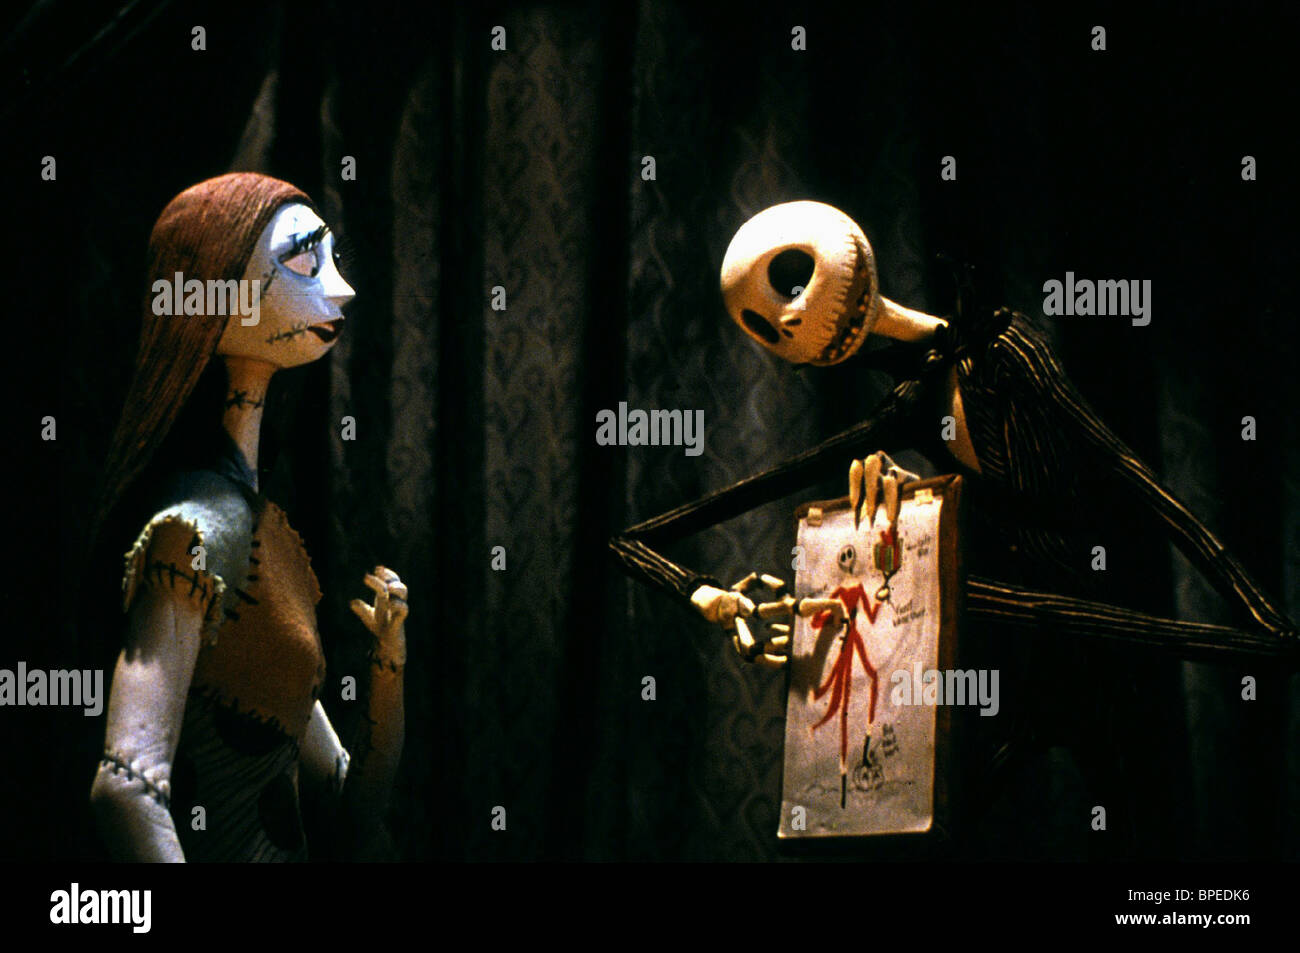 SALLY SHOCK & JACK SKELLINGTON THE NIGHTMARE BEFORE CHRISTMAS (1993 ...